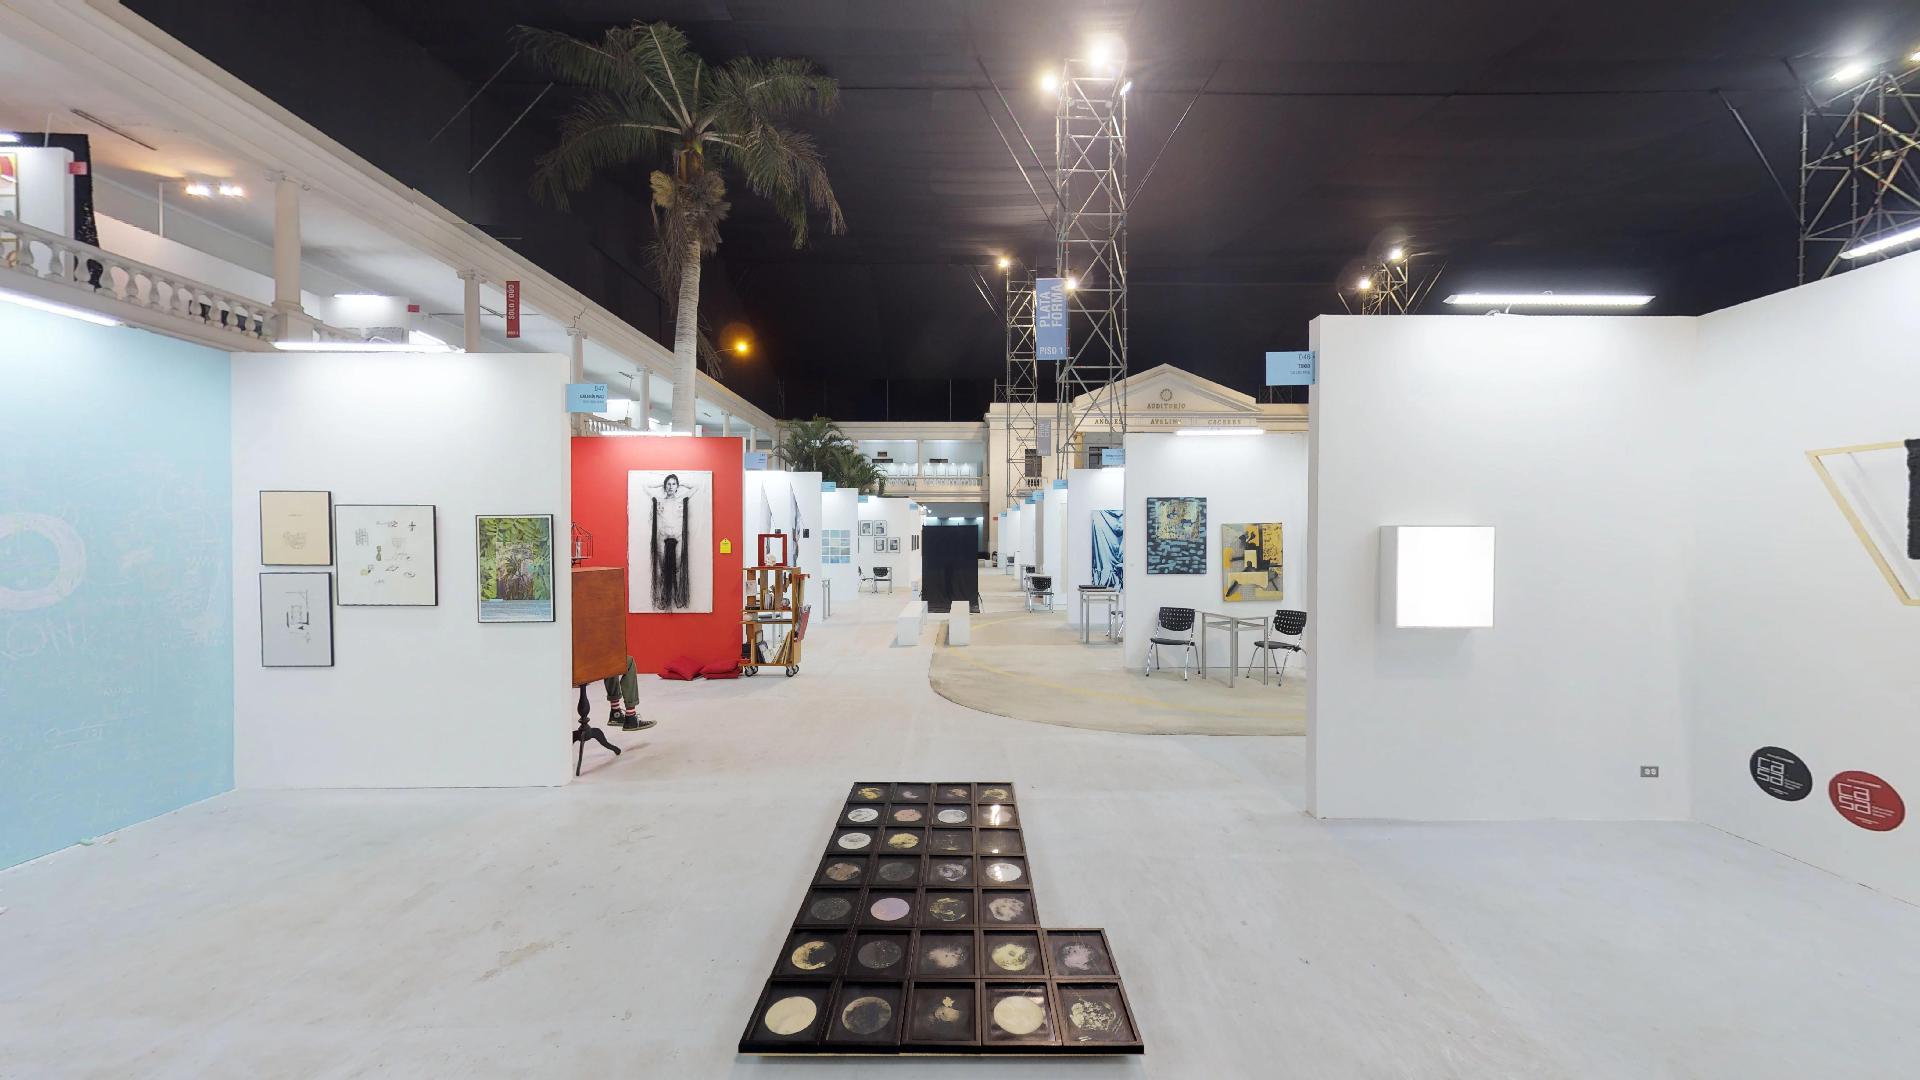 recorrido virtual de la feria art lima Perú 2018